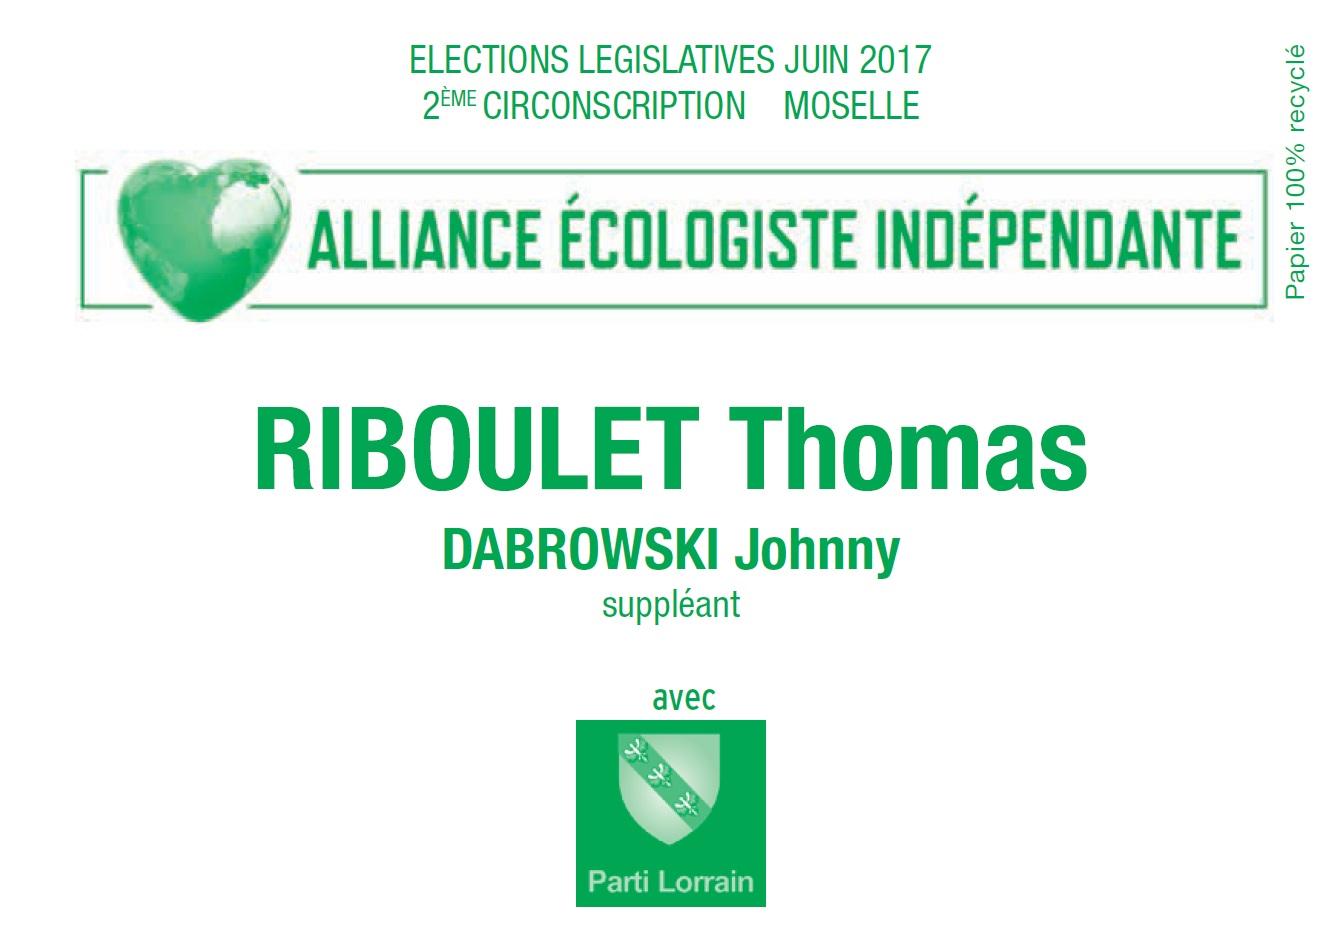 Bulletin de vote thomas riboulet 2eme circo moselle